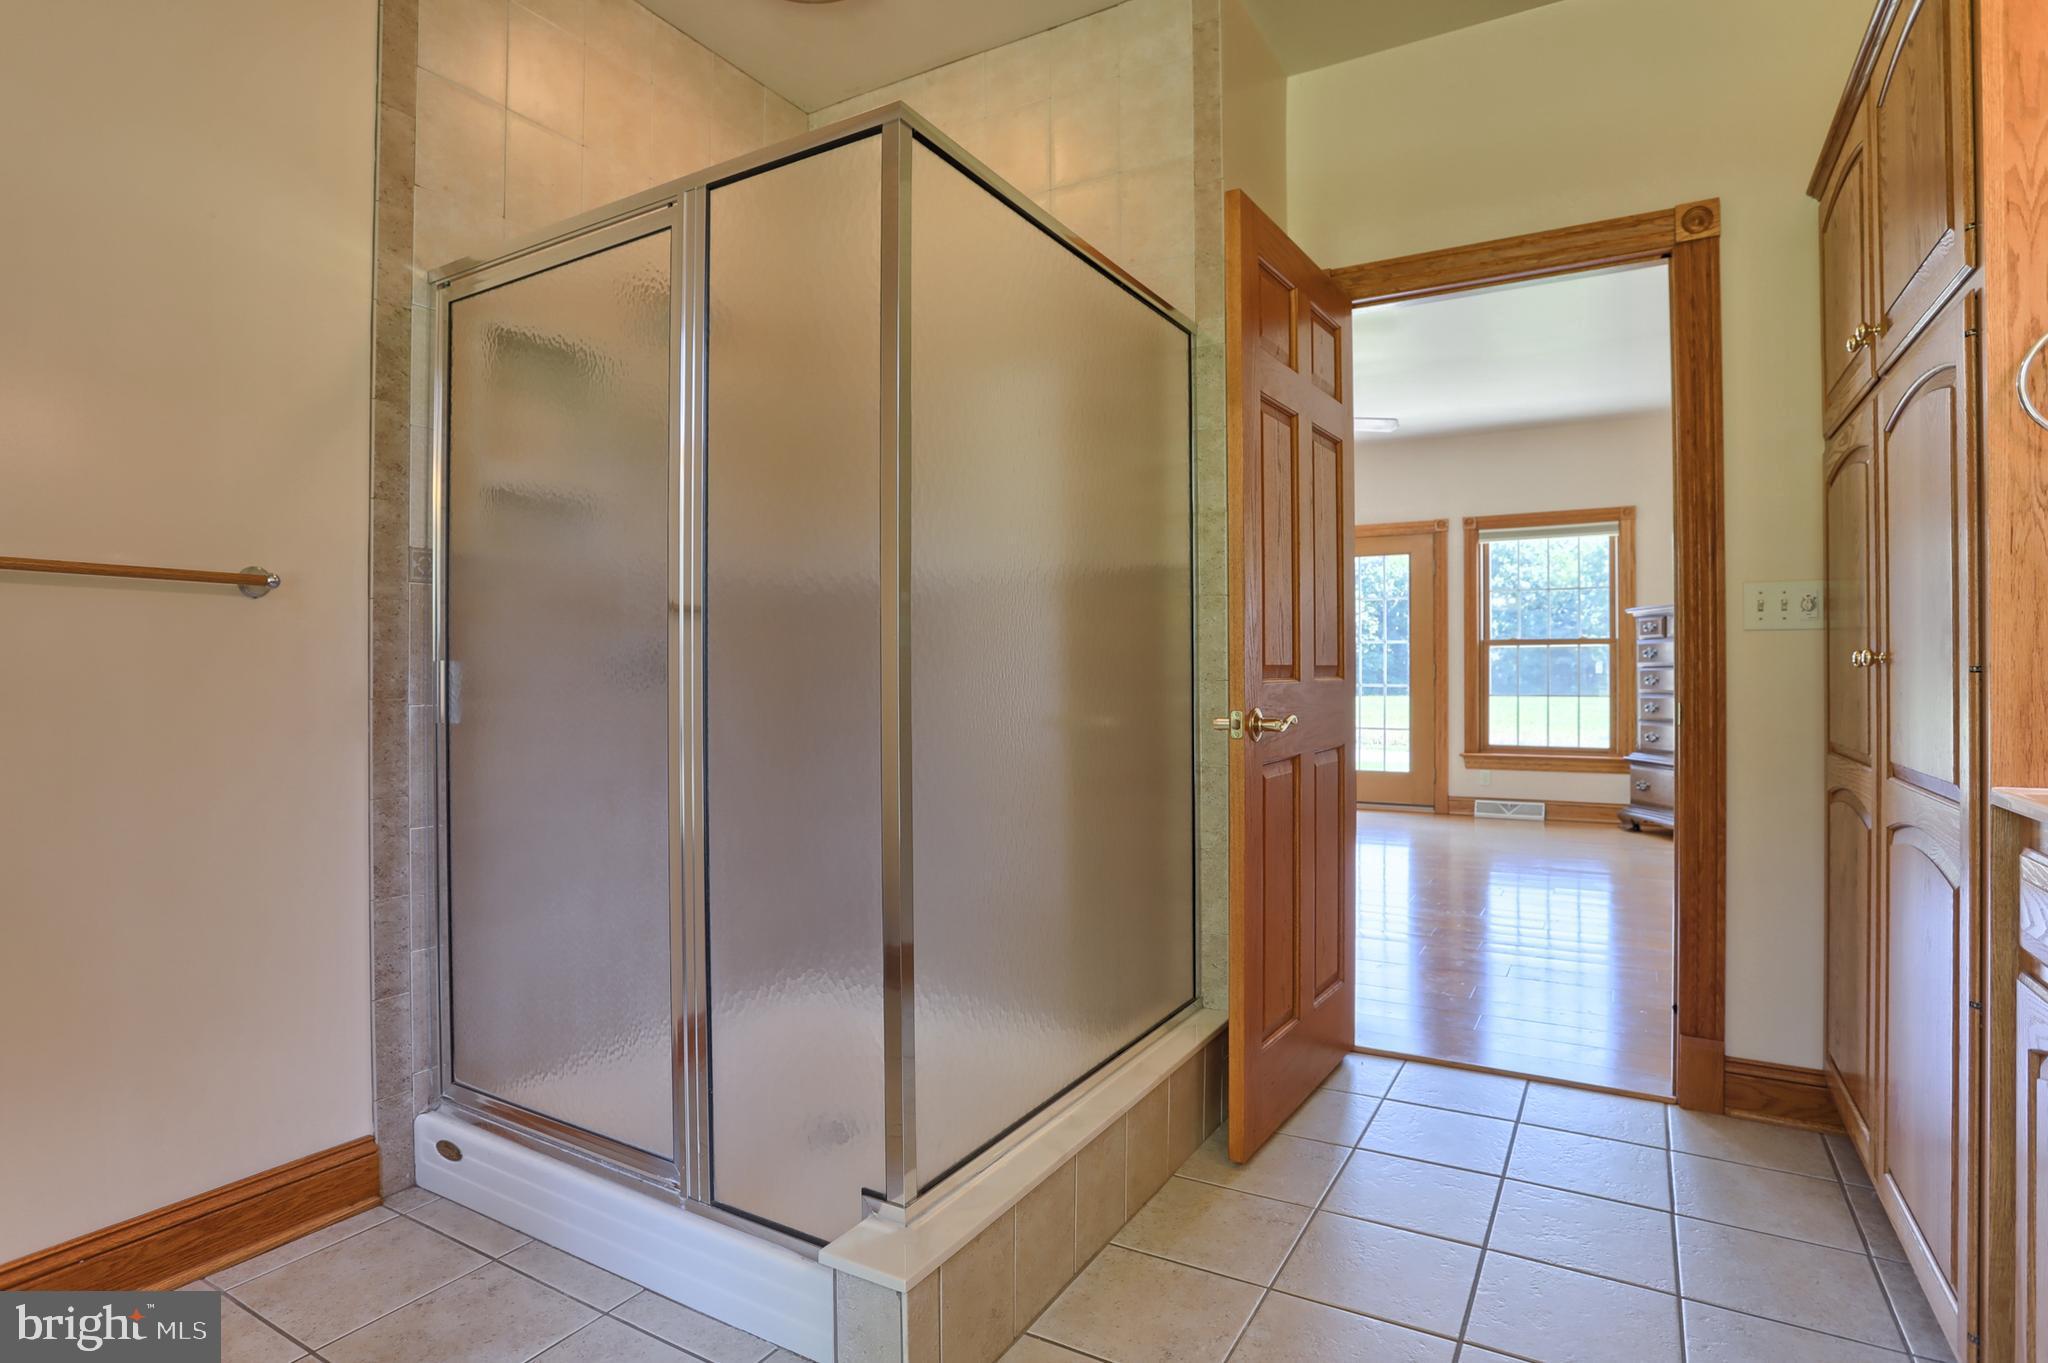 1st Floor Master Bath - View 2